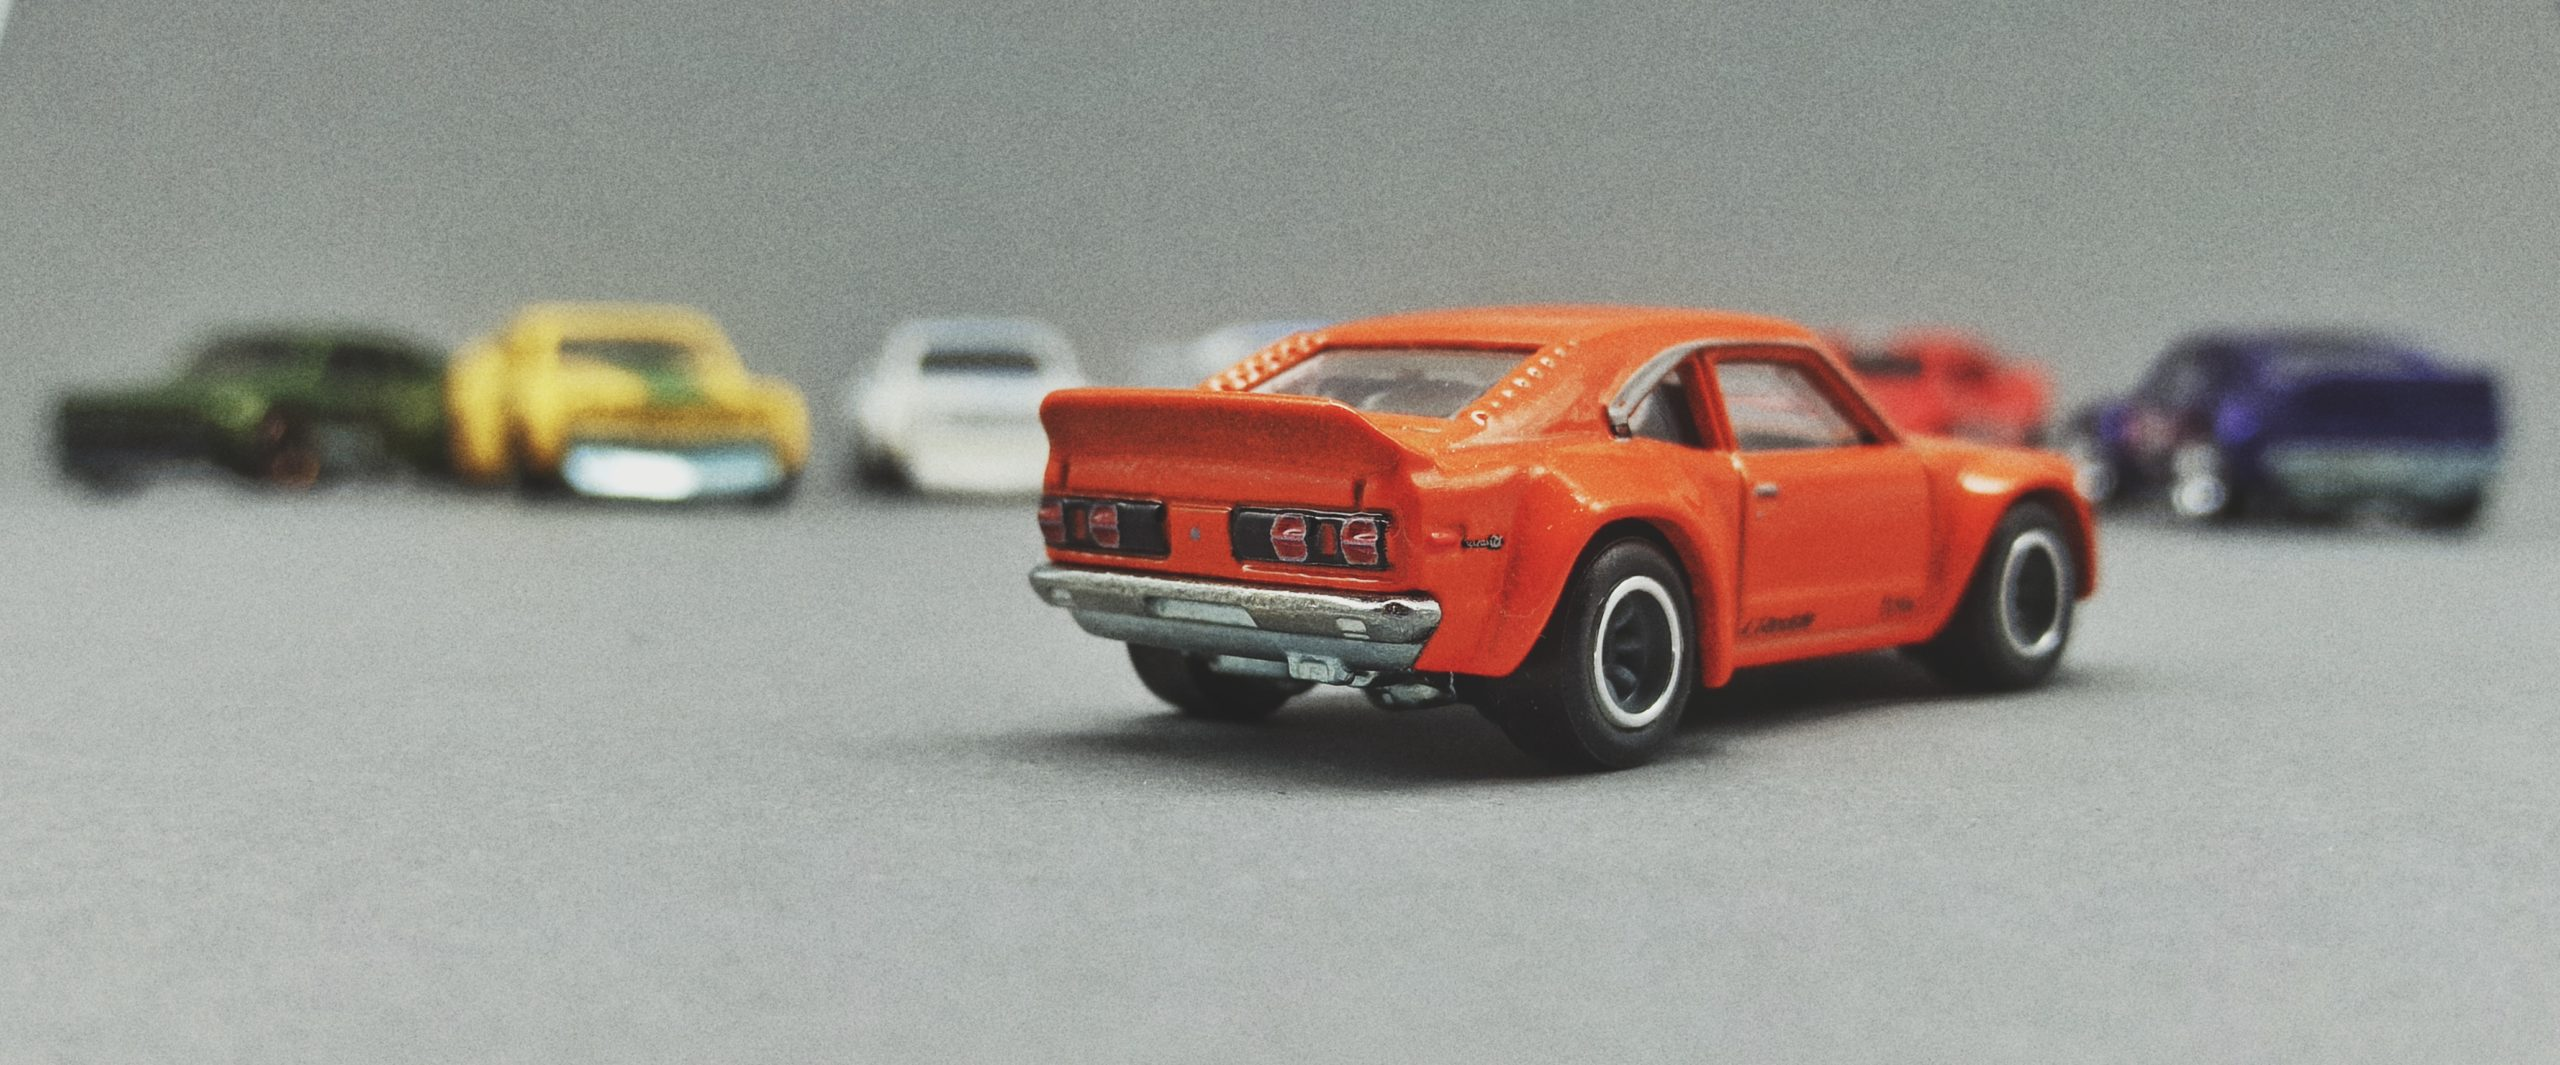 Hot Wheels Mazda RX-3 Collection 2018 Car Culture: Japan Historics 2 (2/5), orange (FLC07)